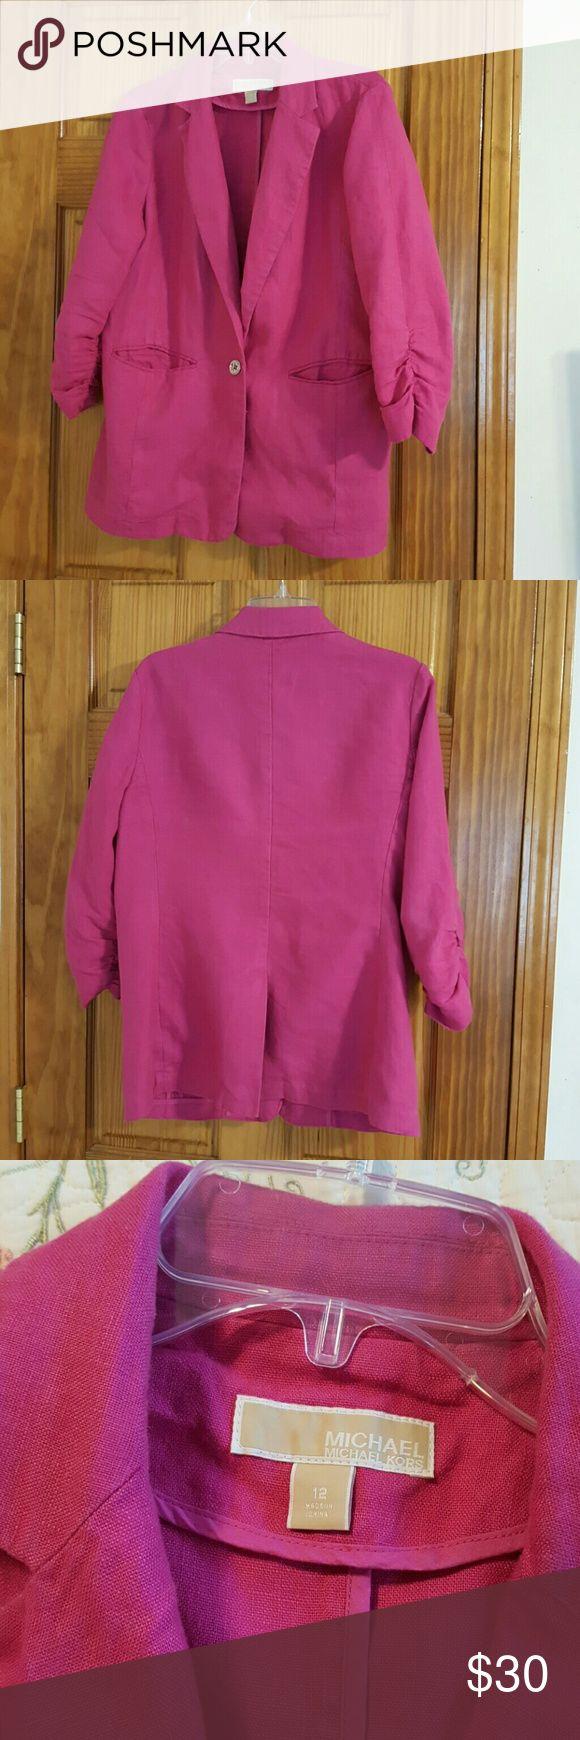 Michael Kors washed Linnen Blazer Pink Michael Kors washed Linnen Blazer Pink super soft and comfy Michael Kors  Jackets & Coats Blazers